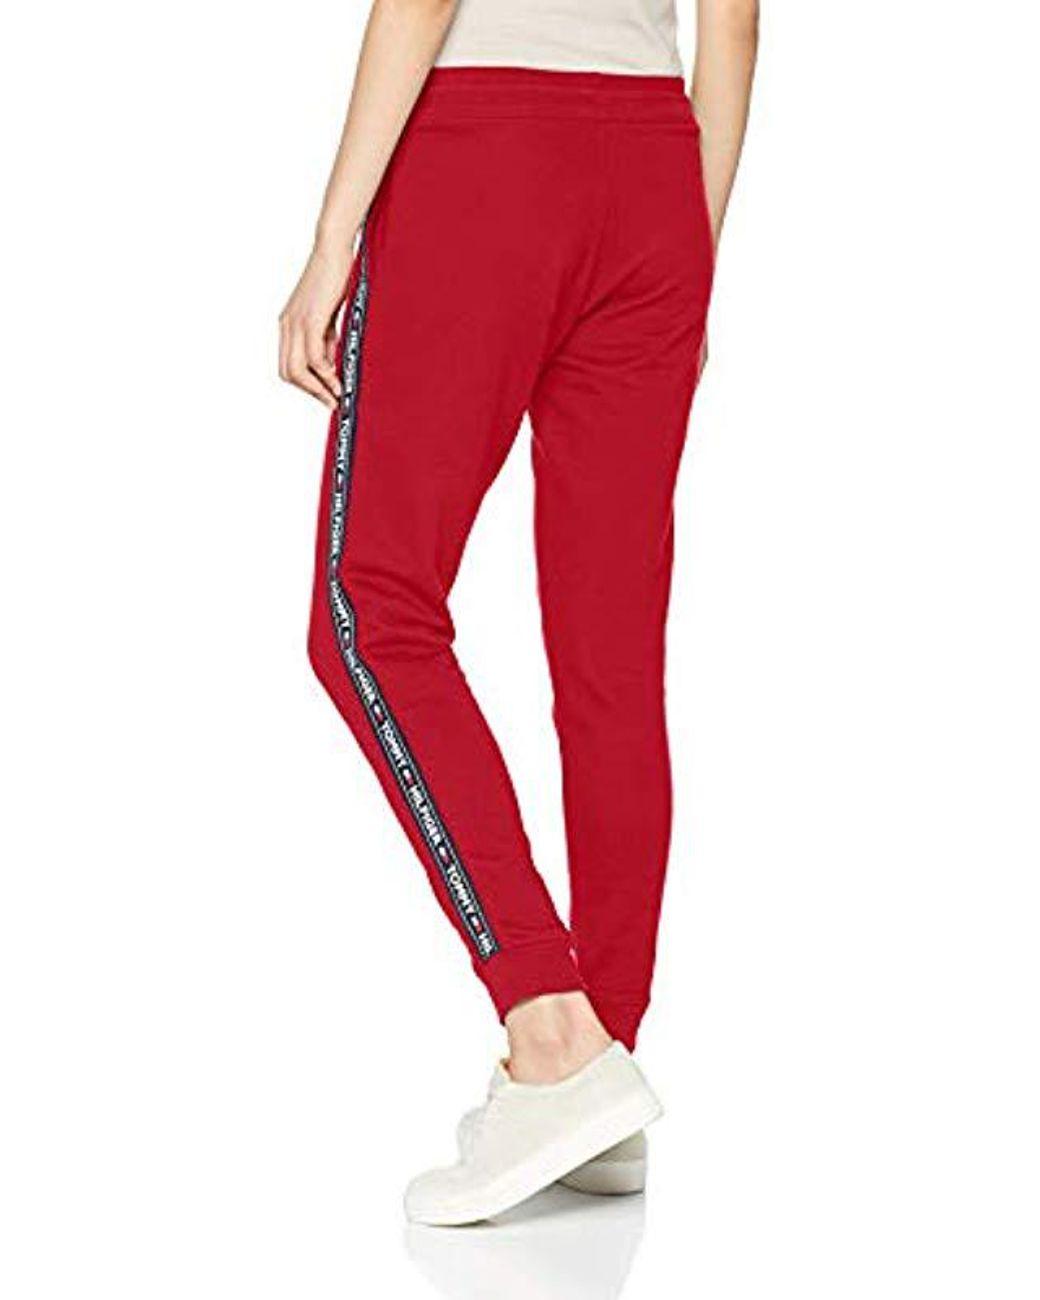 Mujer Tommy Hilfiger Legging Gold Set Ls Print Pantalones De Pijama Para Mujer Ropa Celp Es